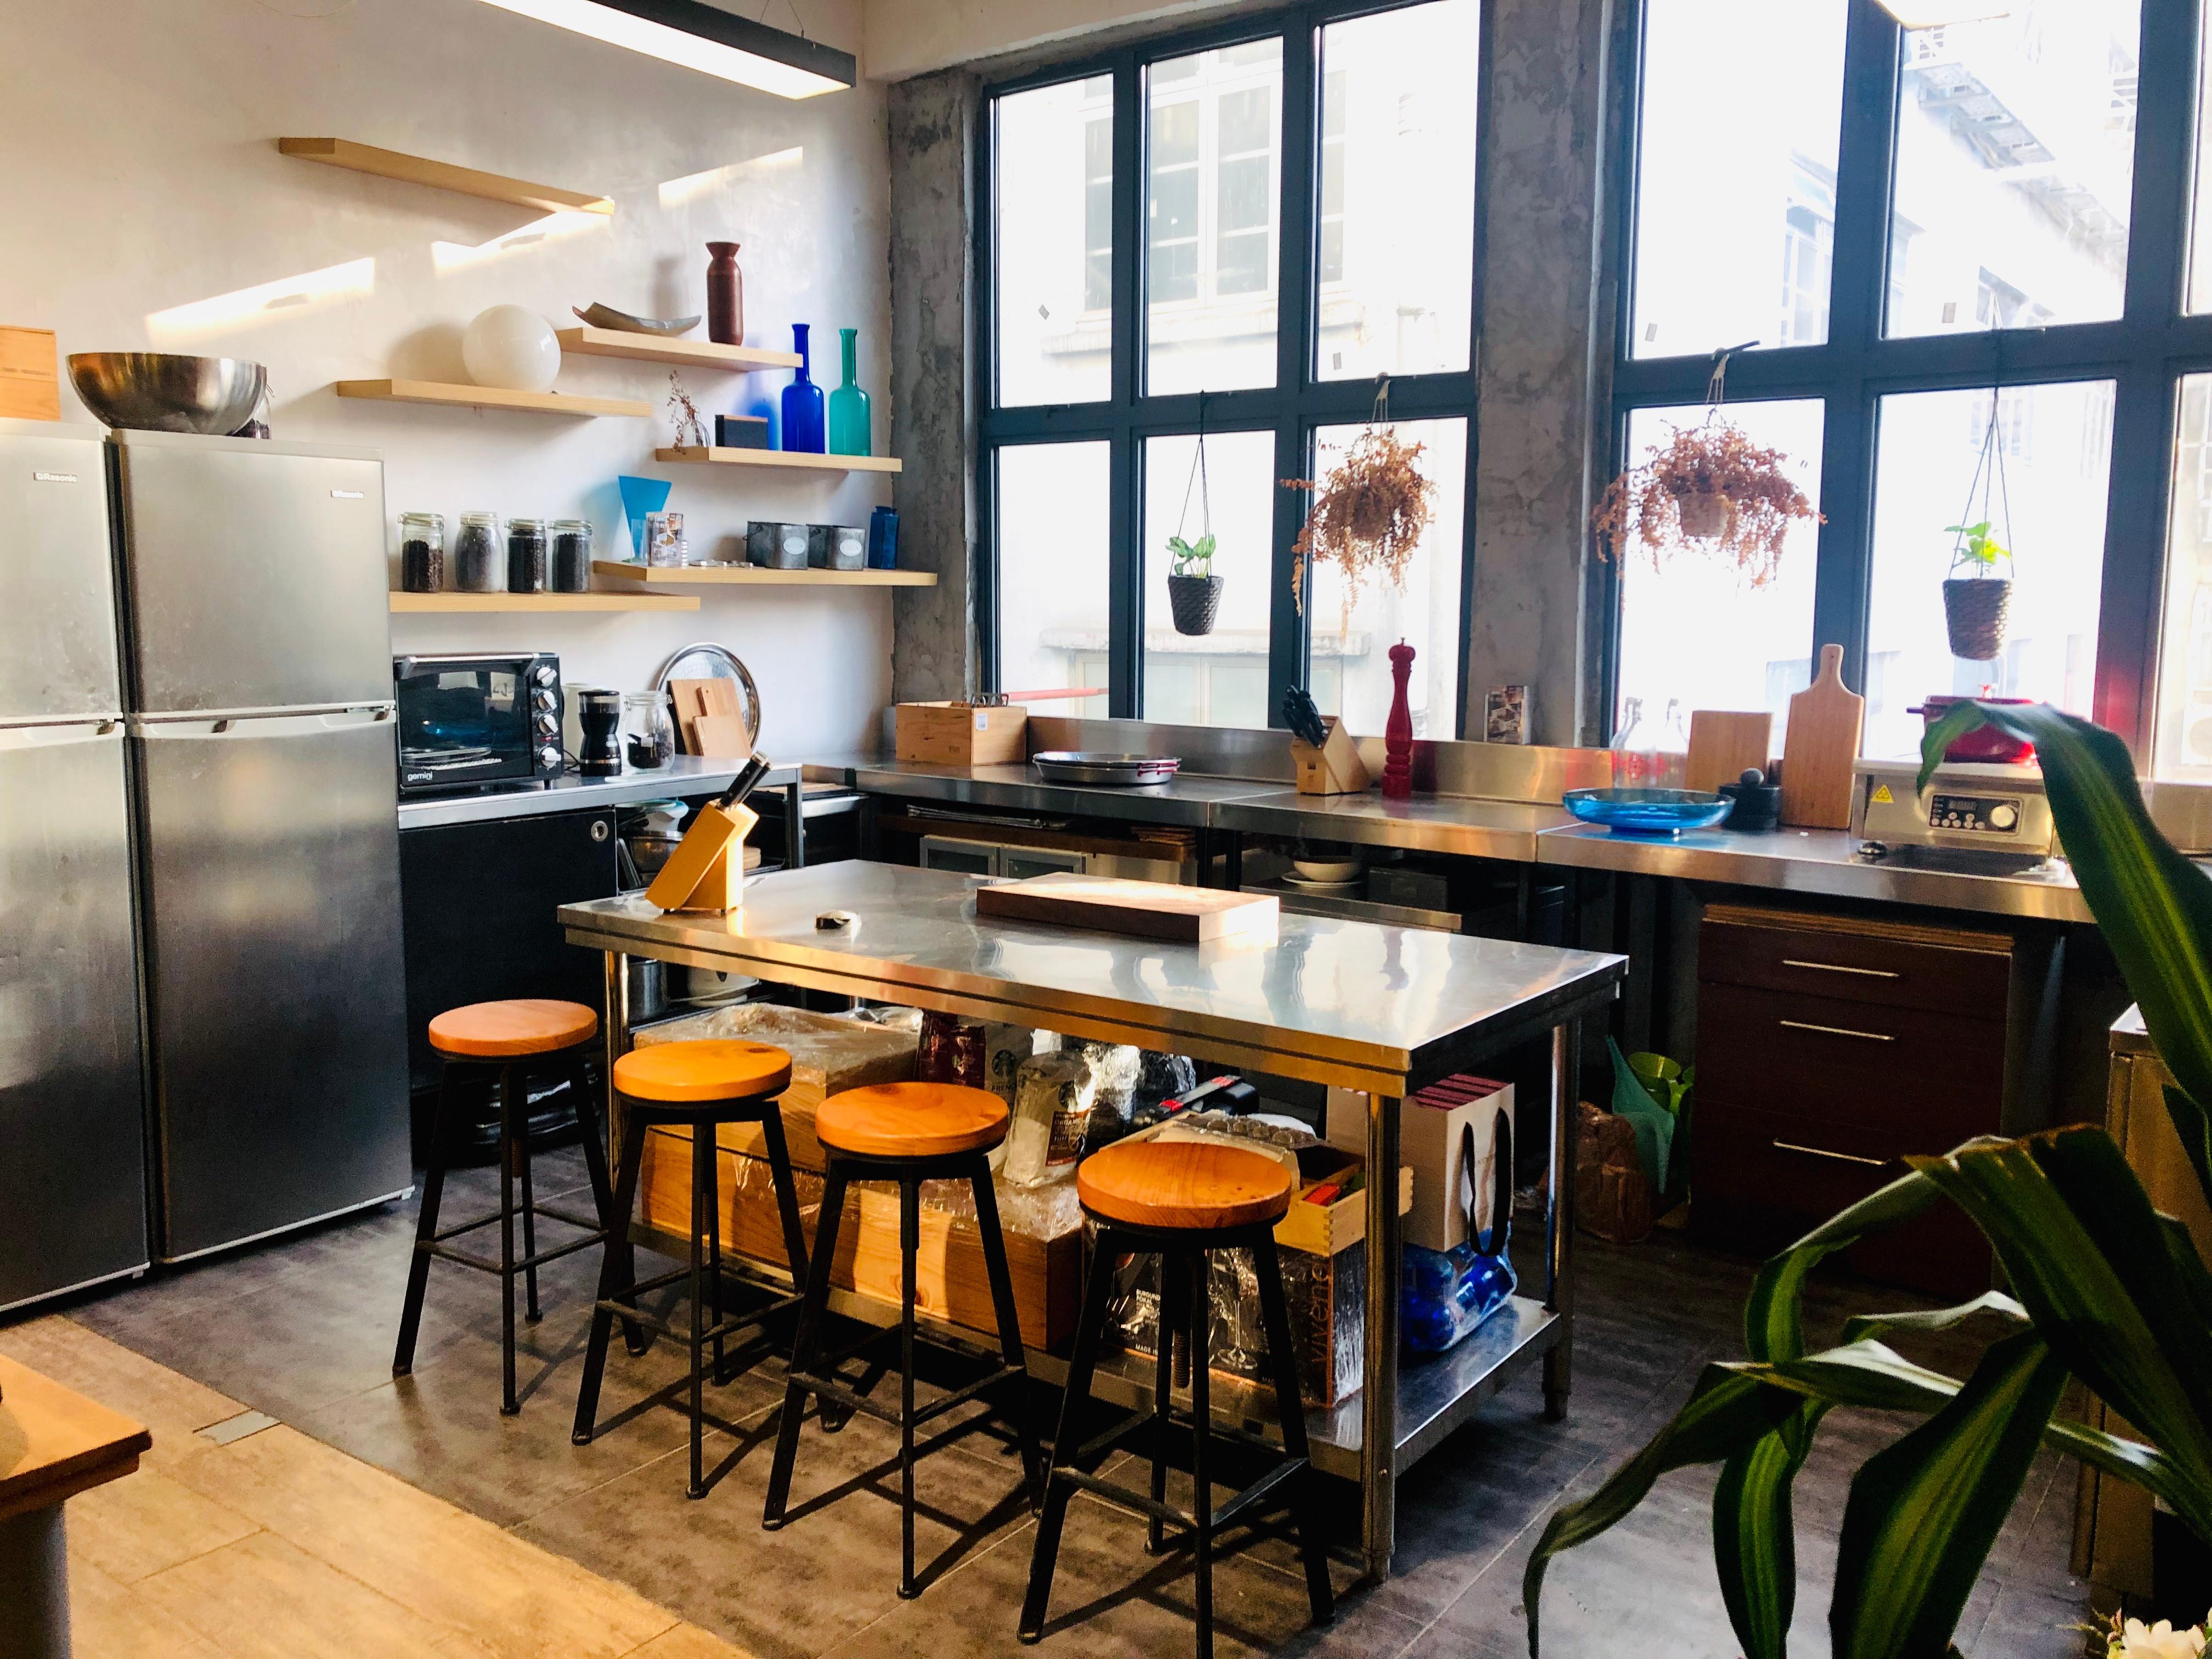 Private Kitchen (2 hour rental)